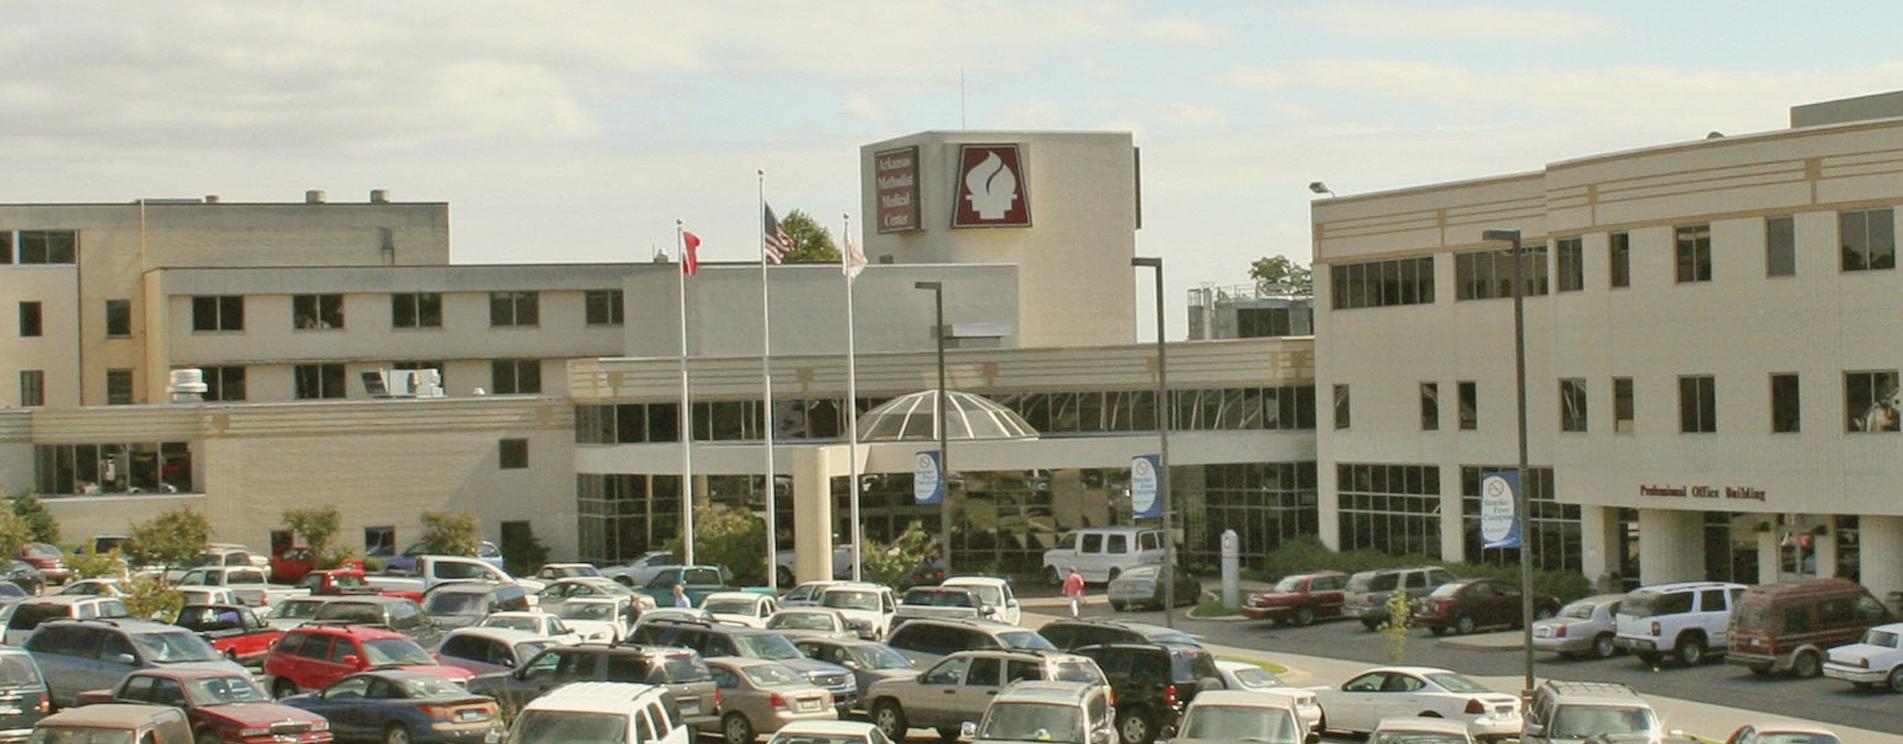 AMMC › Healthcare Services & Wellness Center- Arkansas